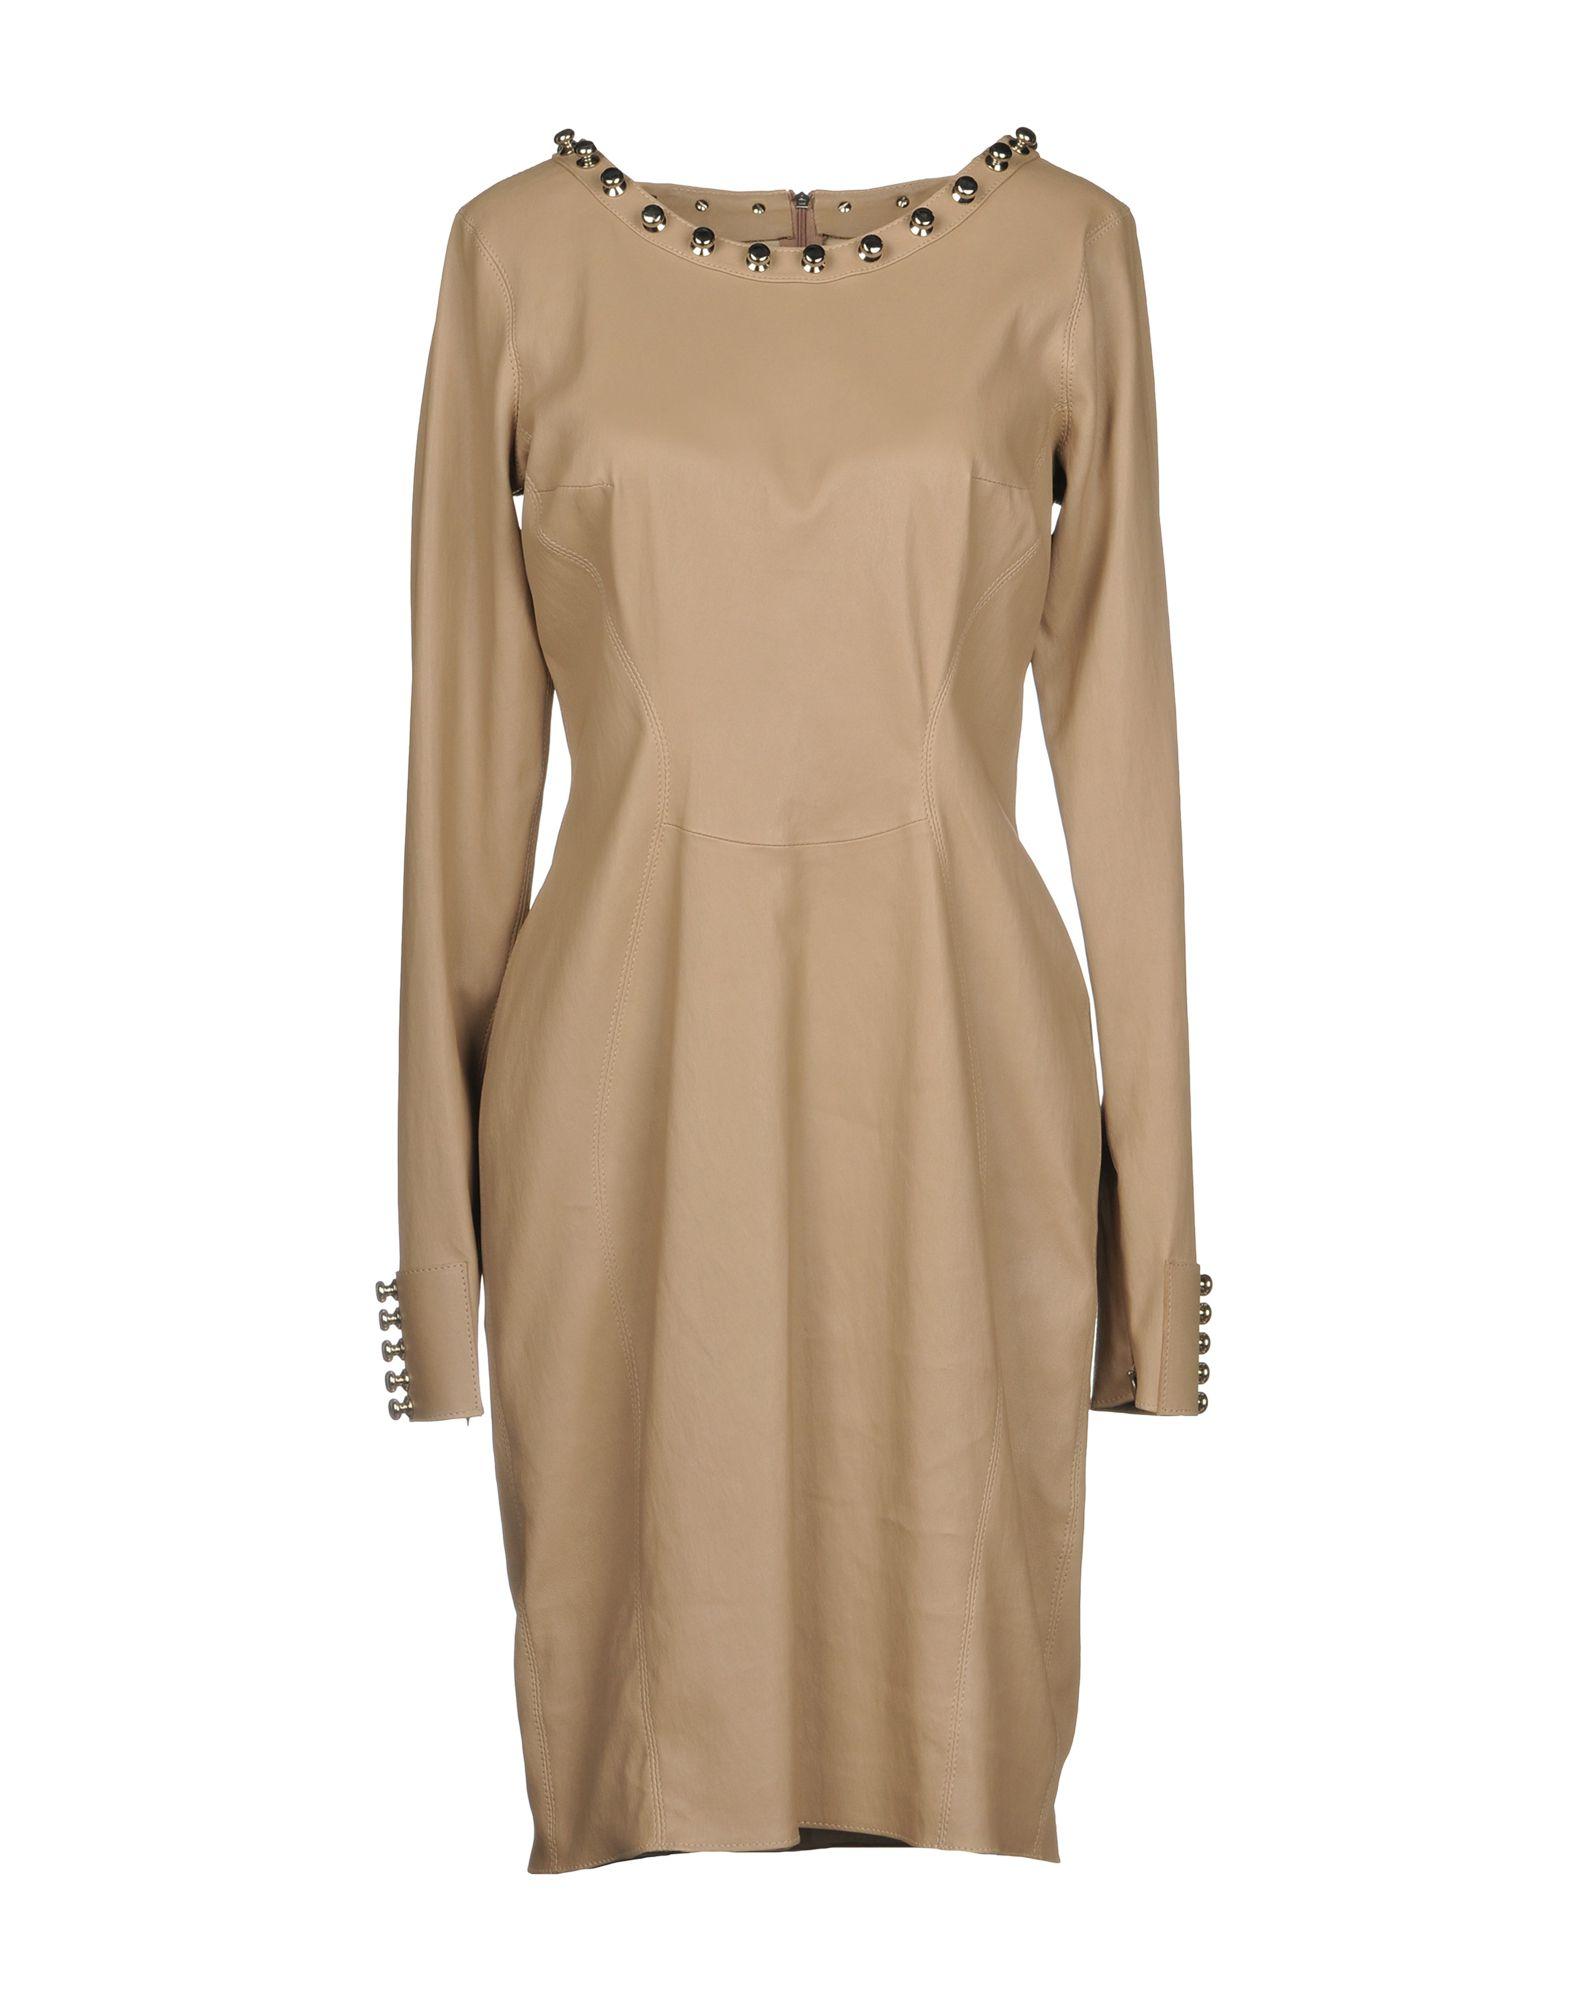 APHERO Short Dress in Beige